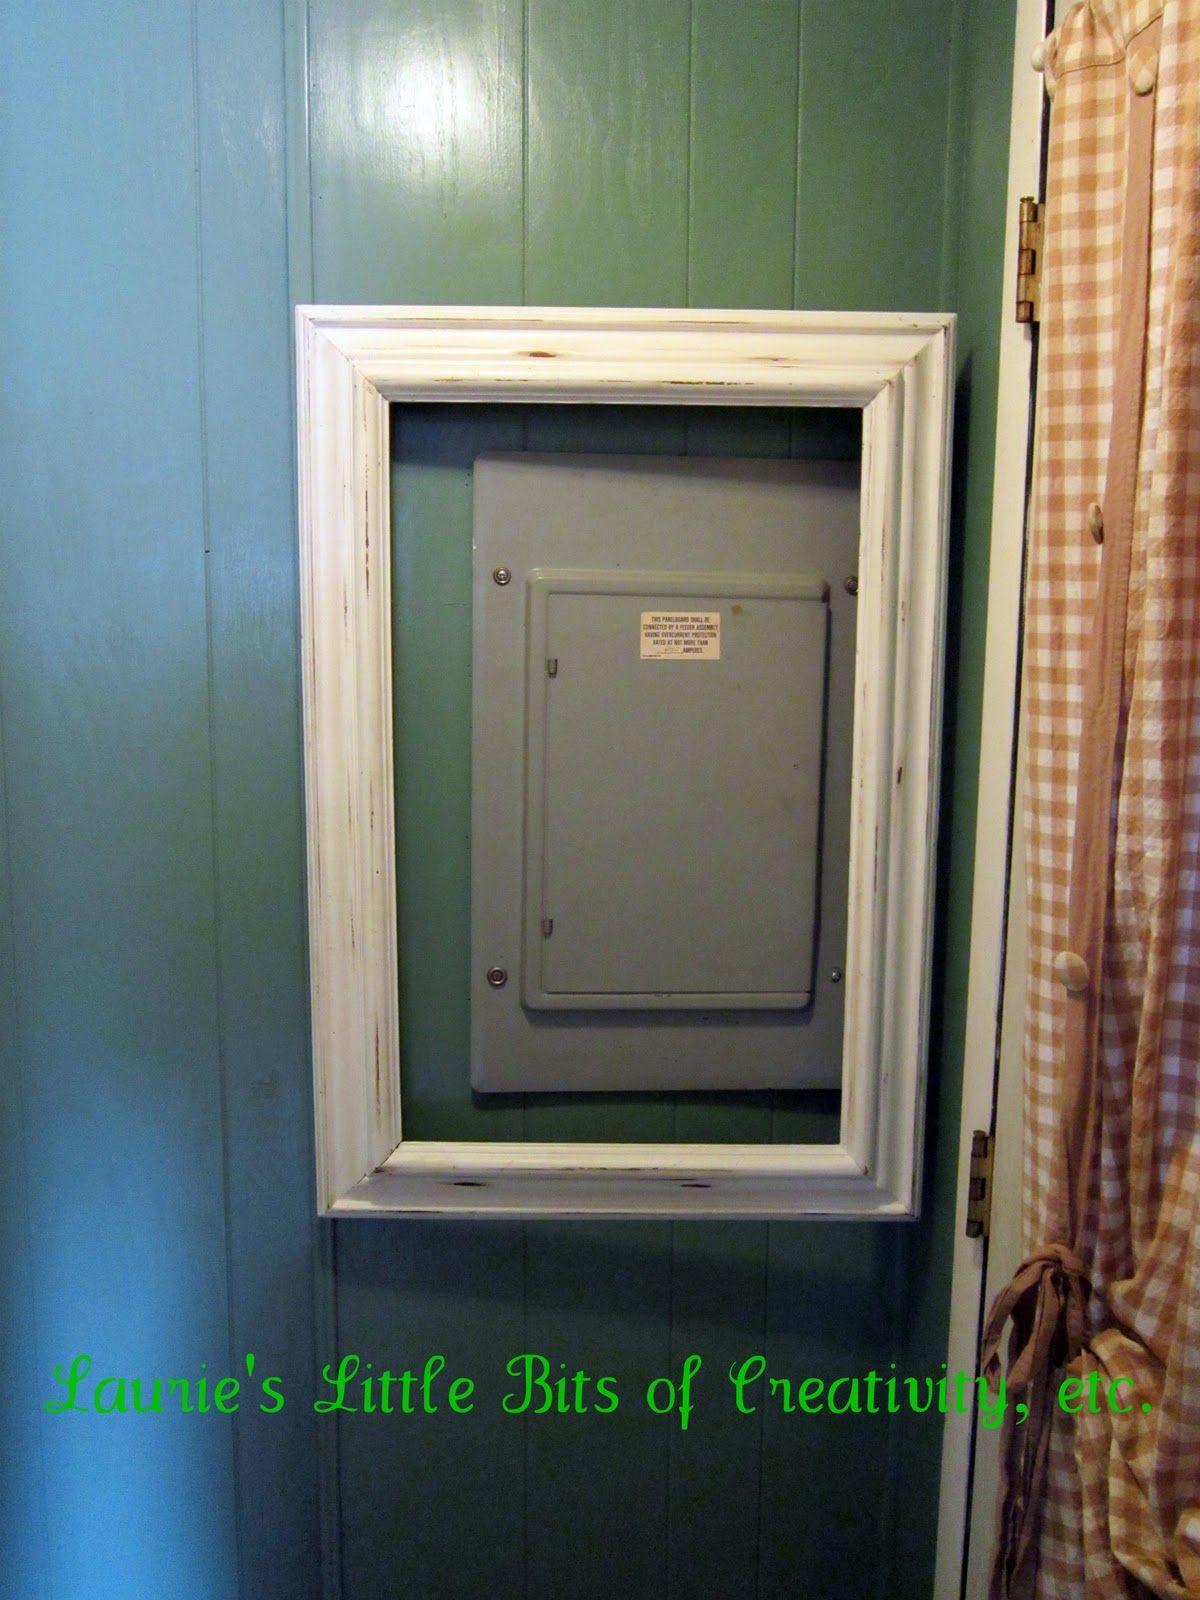 house fuse box cover example electrical wiring diagram u2022 rh cranejapan co Add a Fuse Box Hiding a Fuse Box